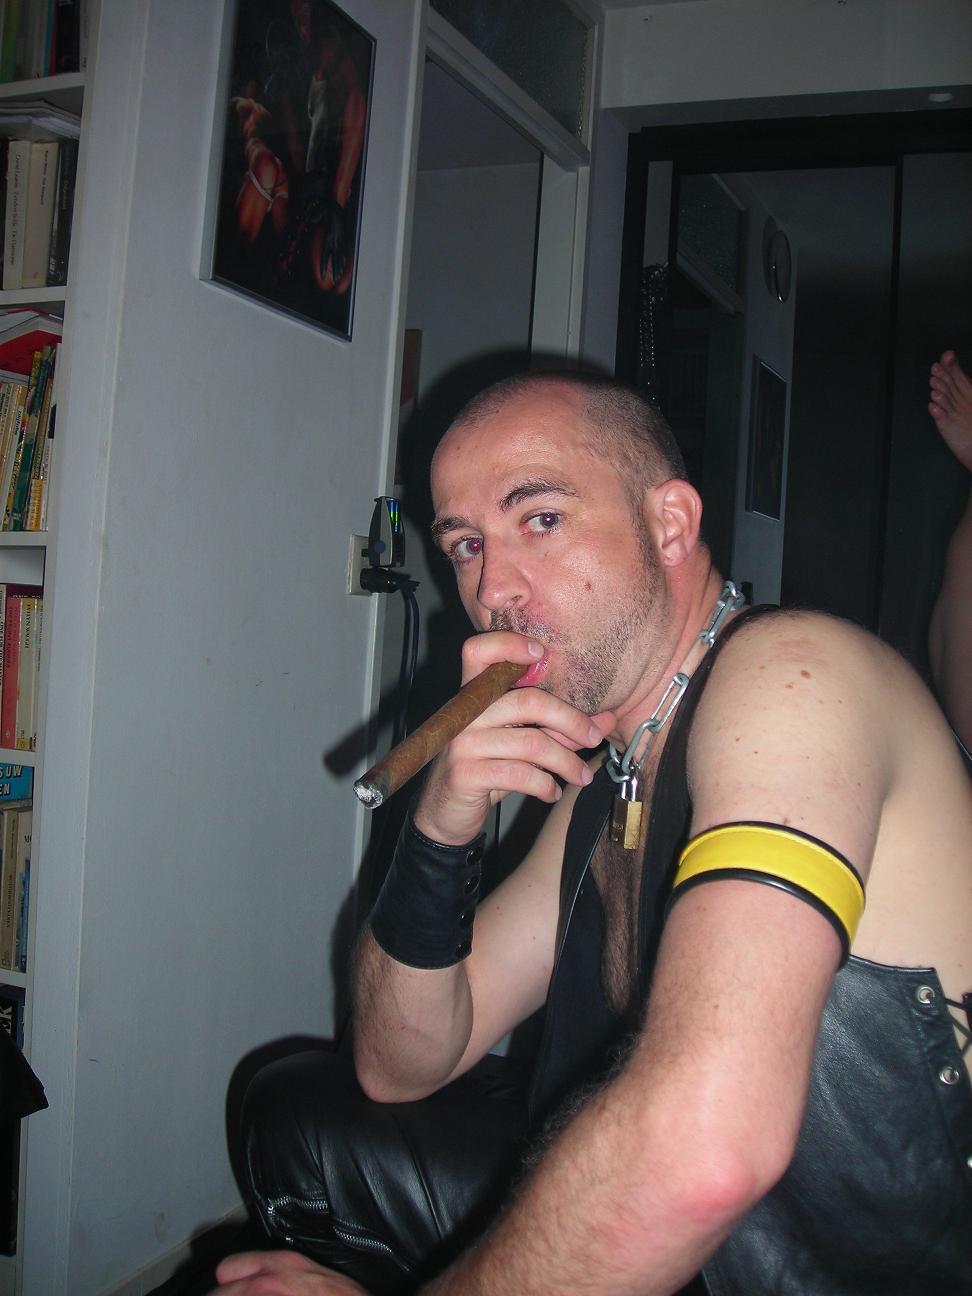 CIGAR SMOKING LEATHER MEN. nude smokers. CIGAR SMOKING LEATHER MEN